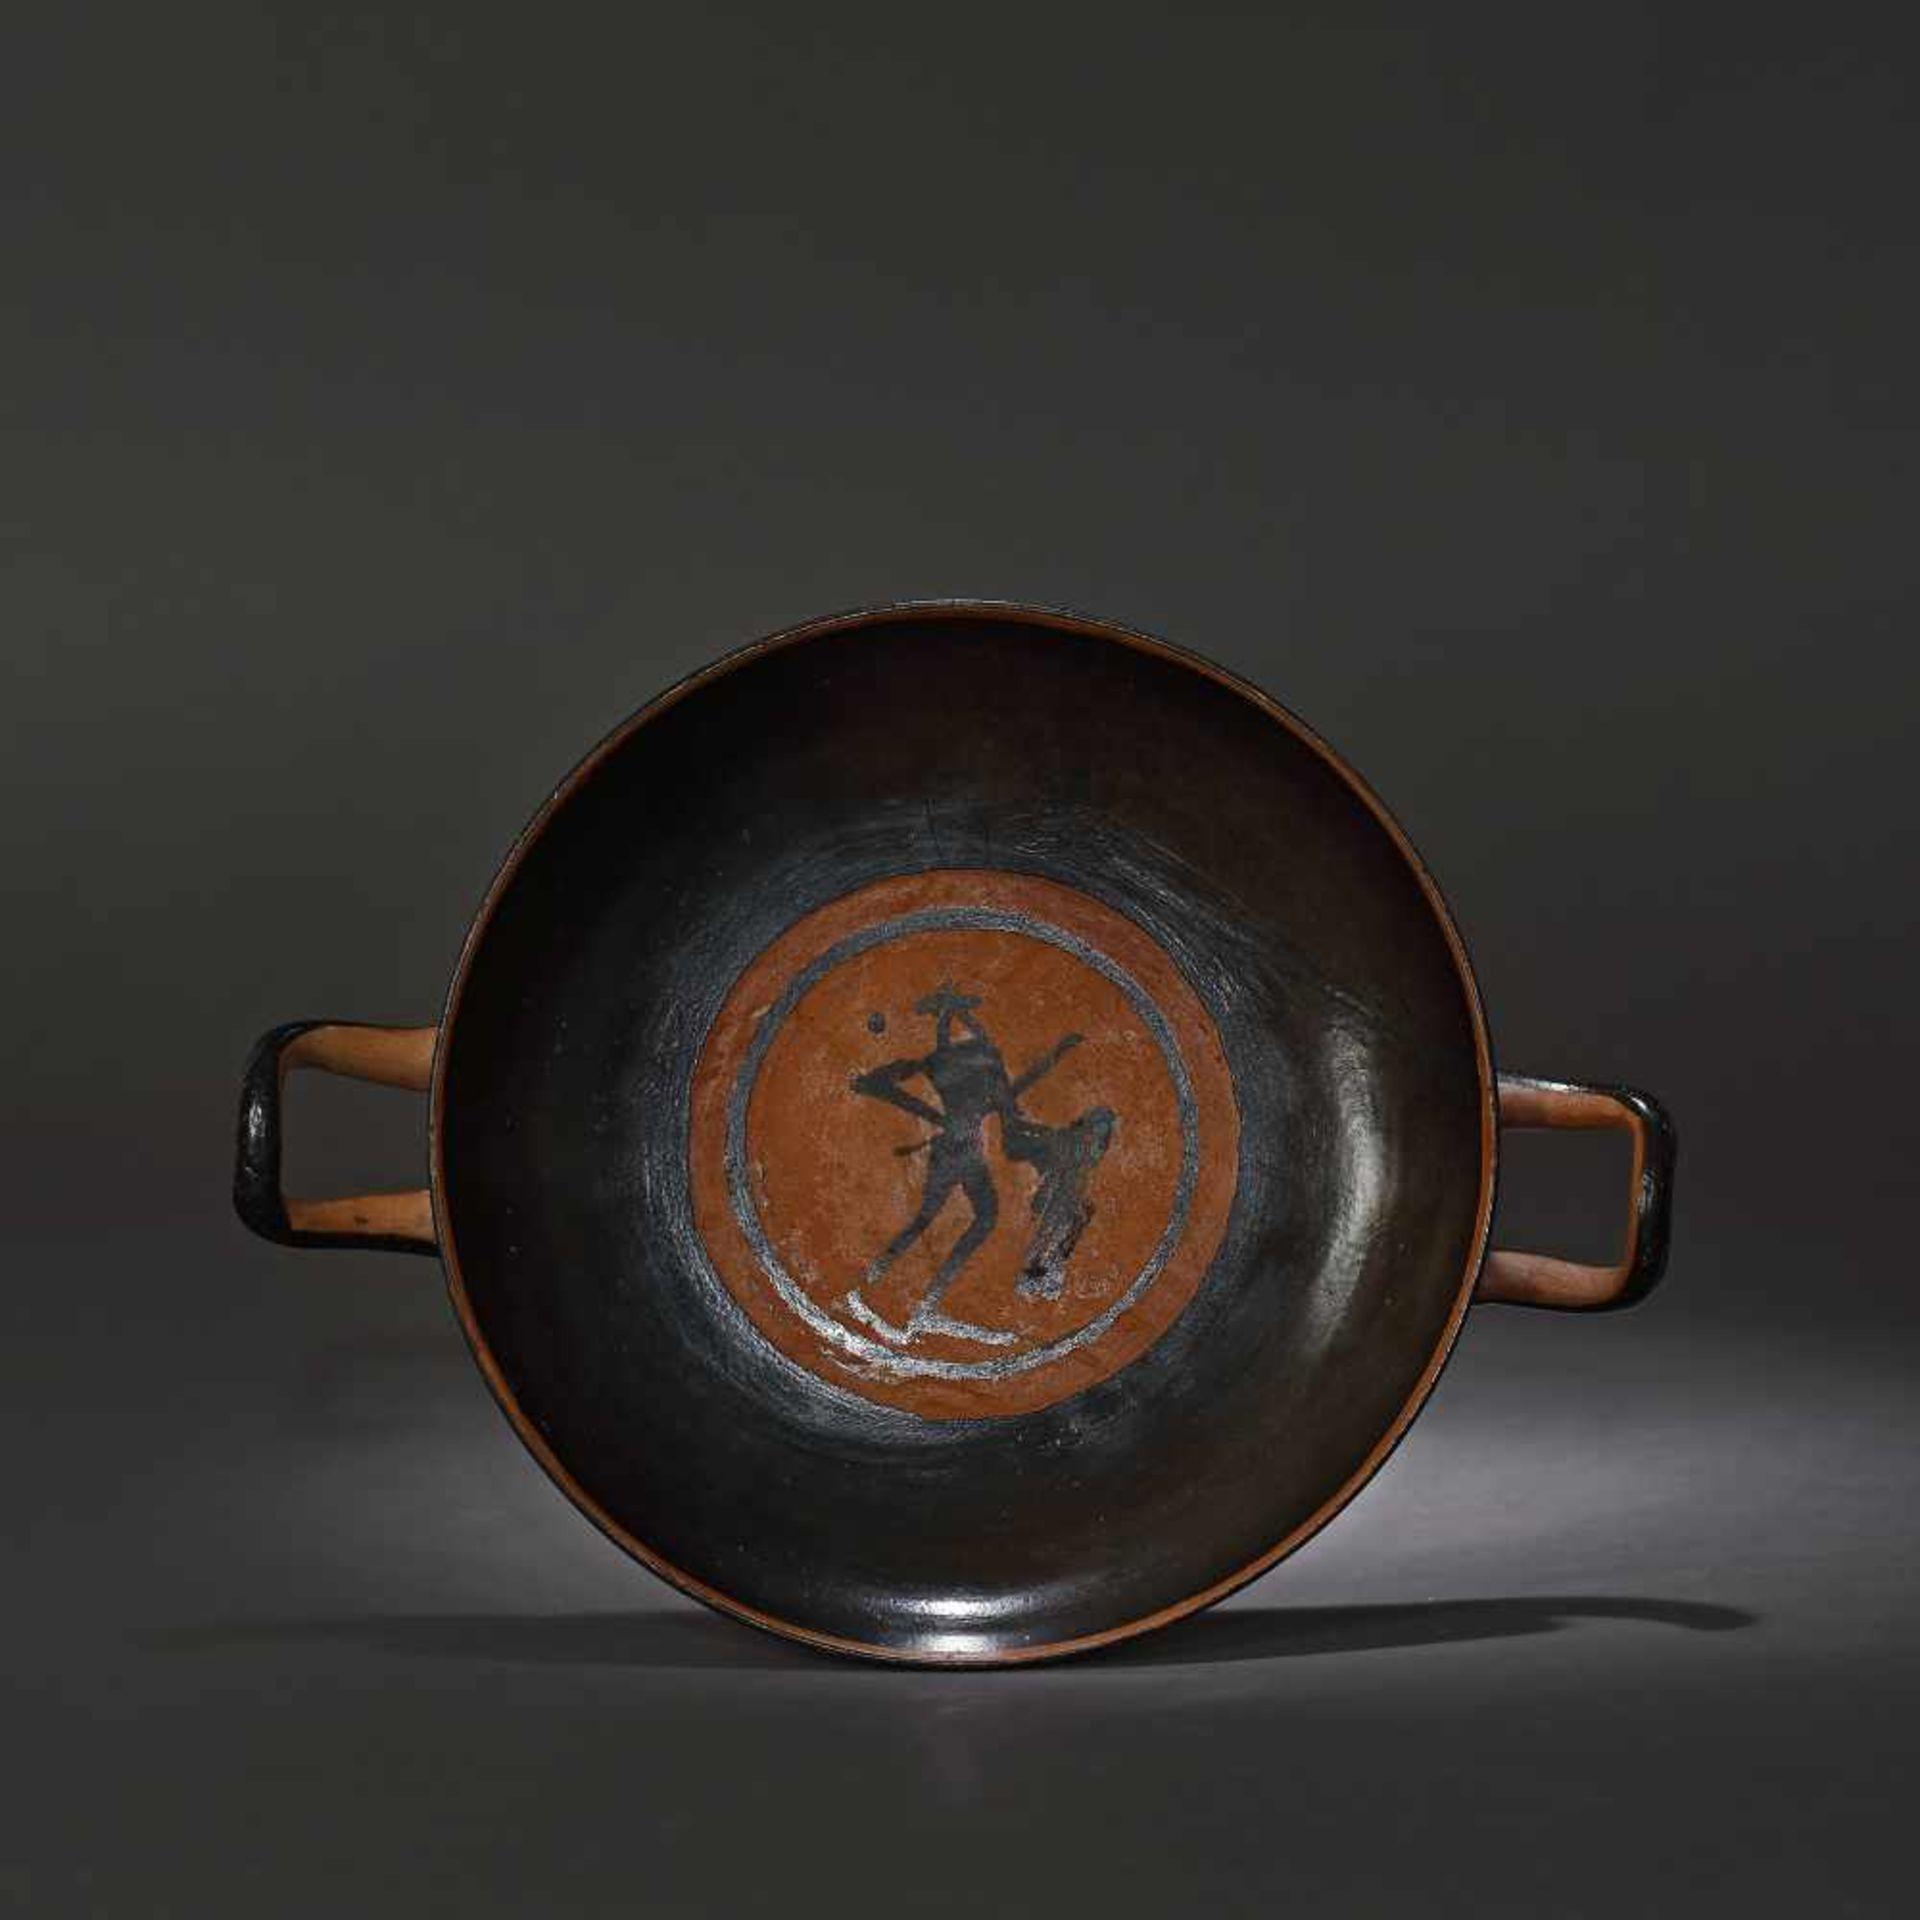 Kylix - ceramic wine jug, black-figure style, Classical Greece, approx. 2,400 years old, 4th century - Bild 5 aus 7